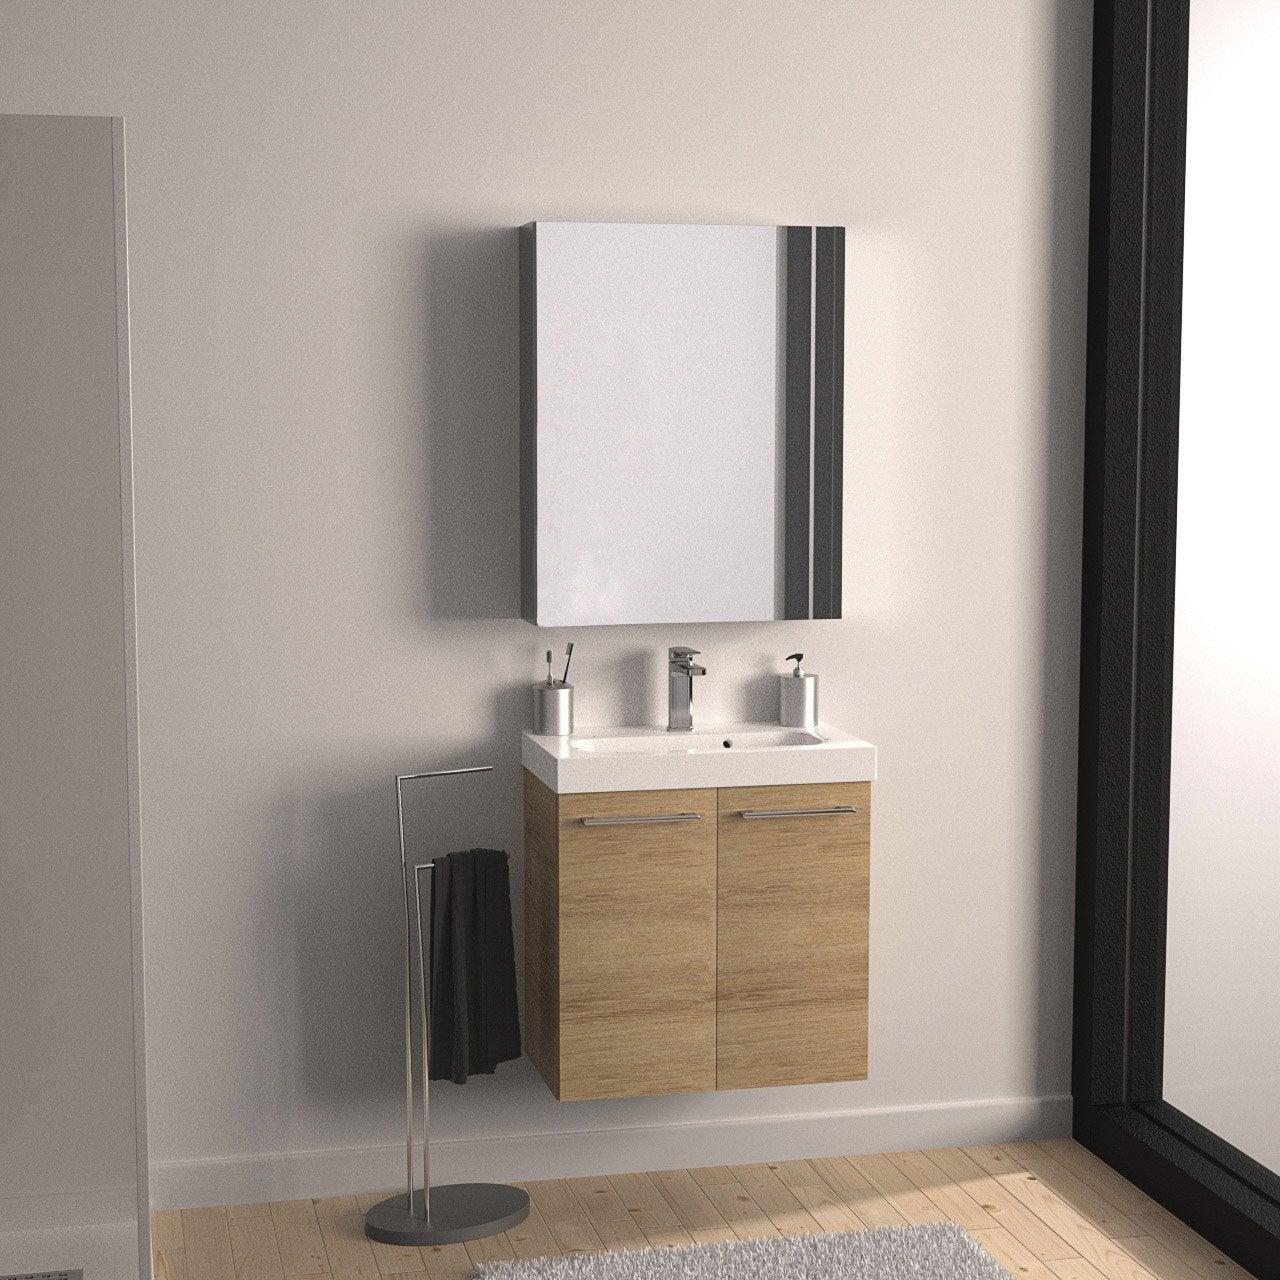 Pose de meuble de salle de bains pr mont largeur max 90 - Meuble de salle de bain avec meuble de cuisine ...